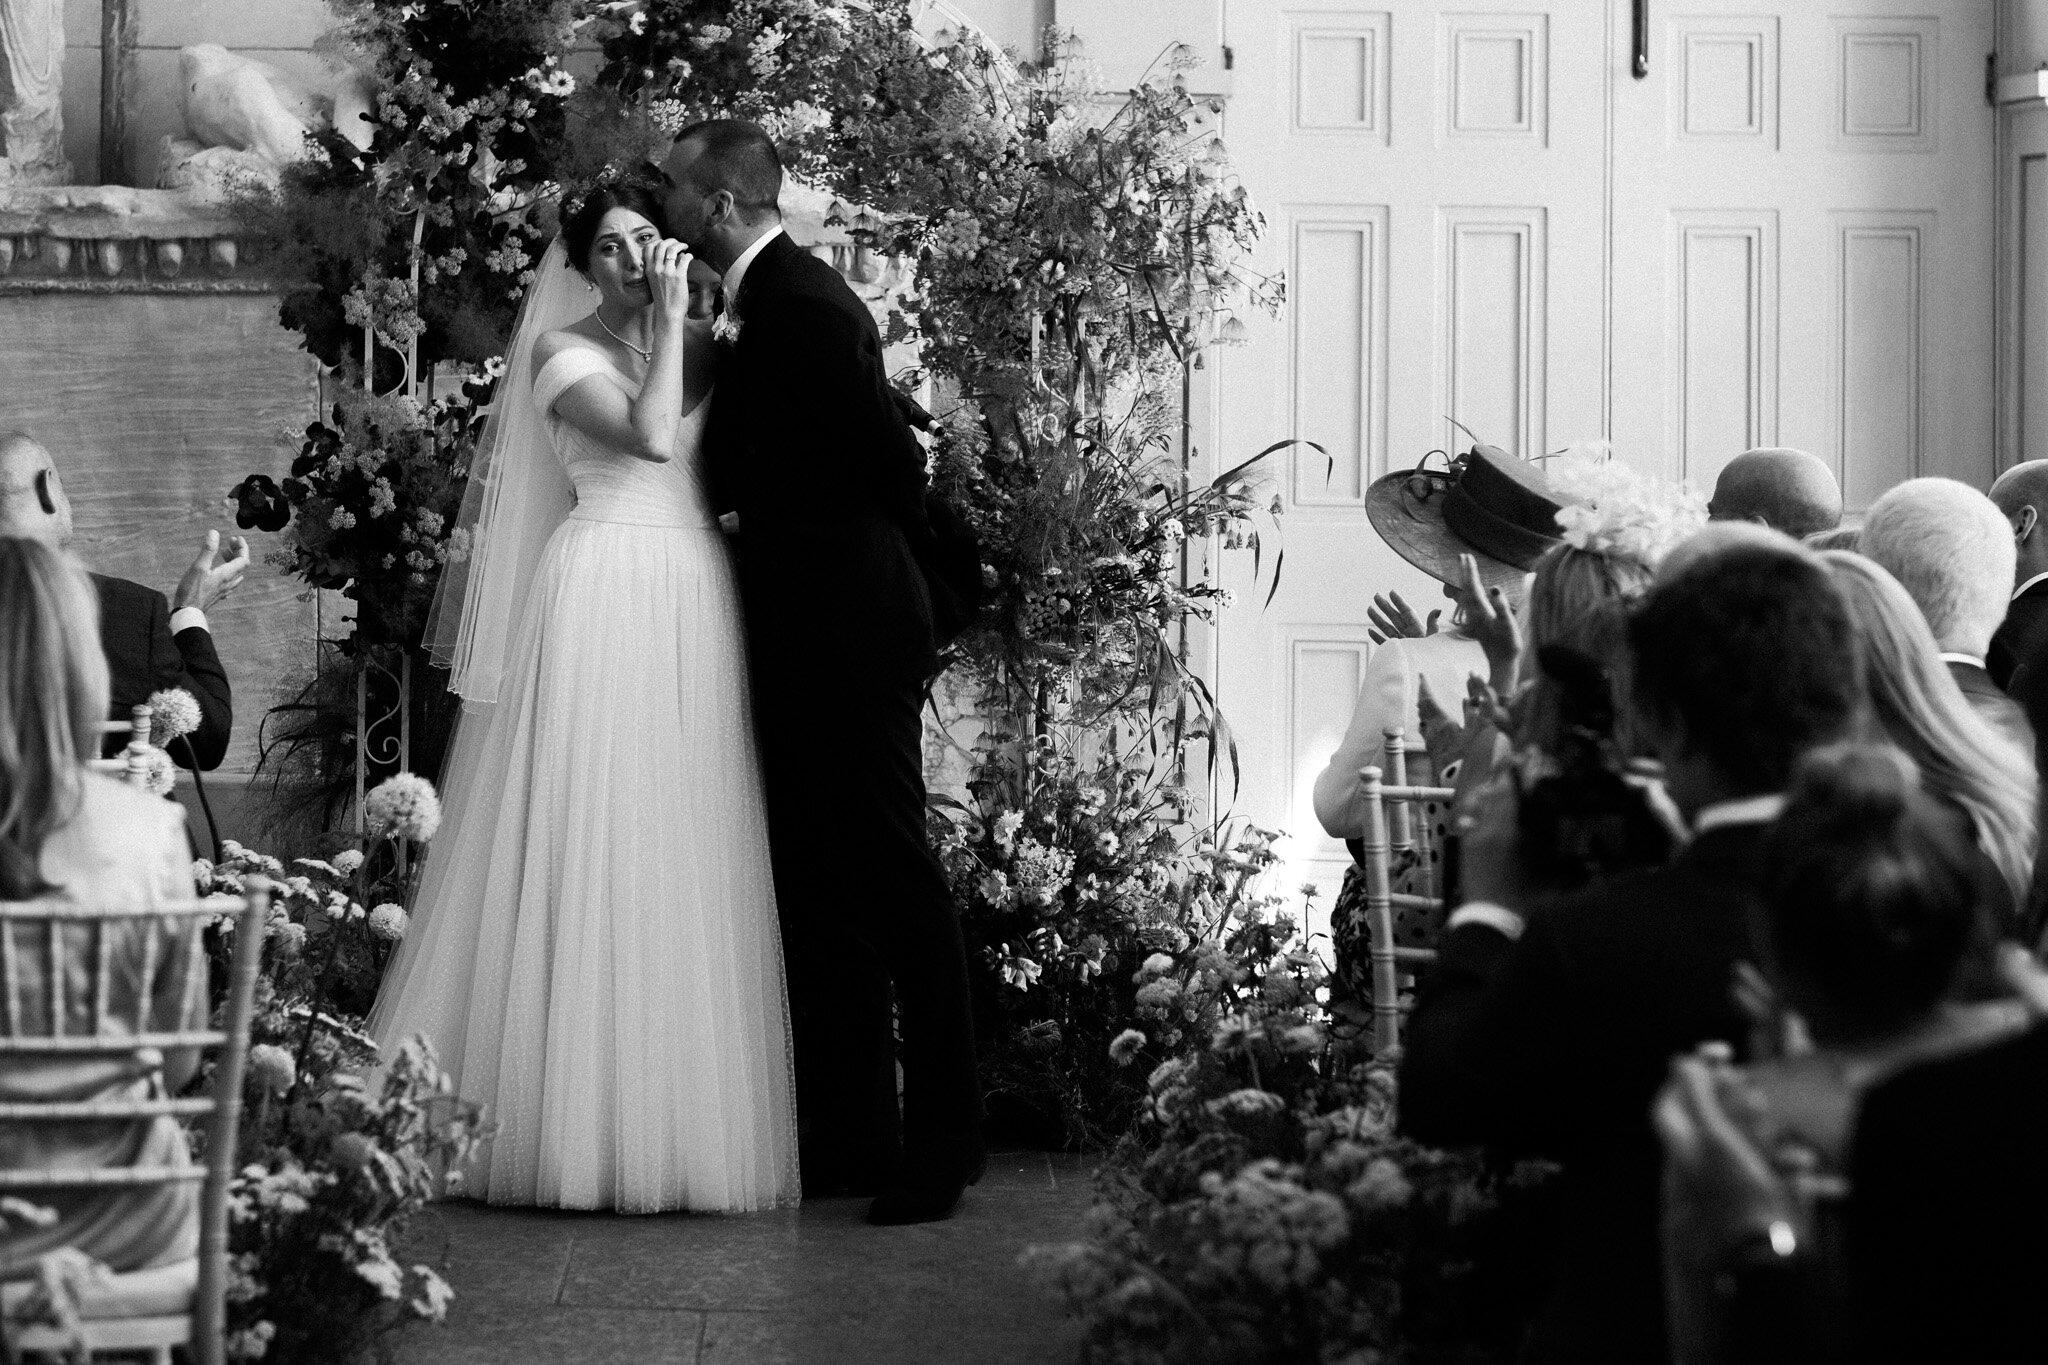 Scott-Stockwell-Photography-wedding-photographer-aynhoe-park-ceremony.jpg